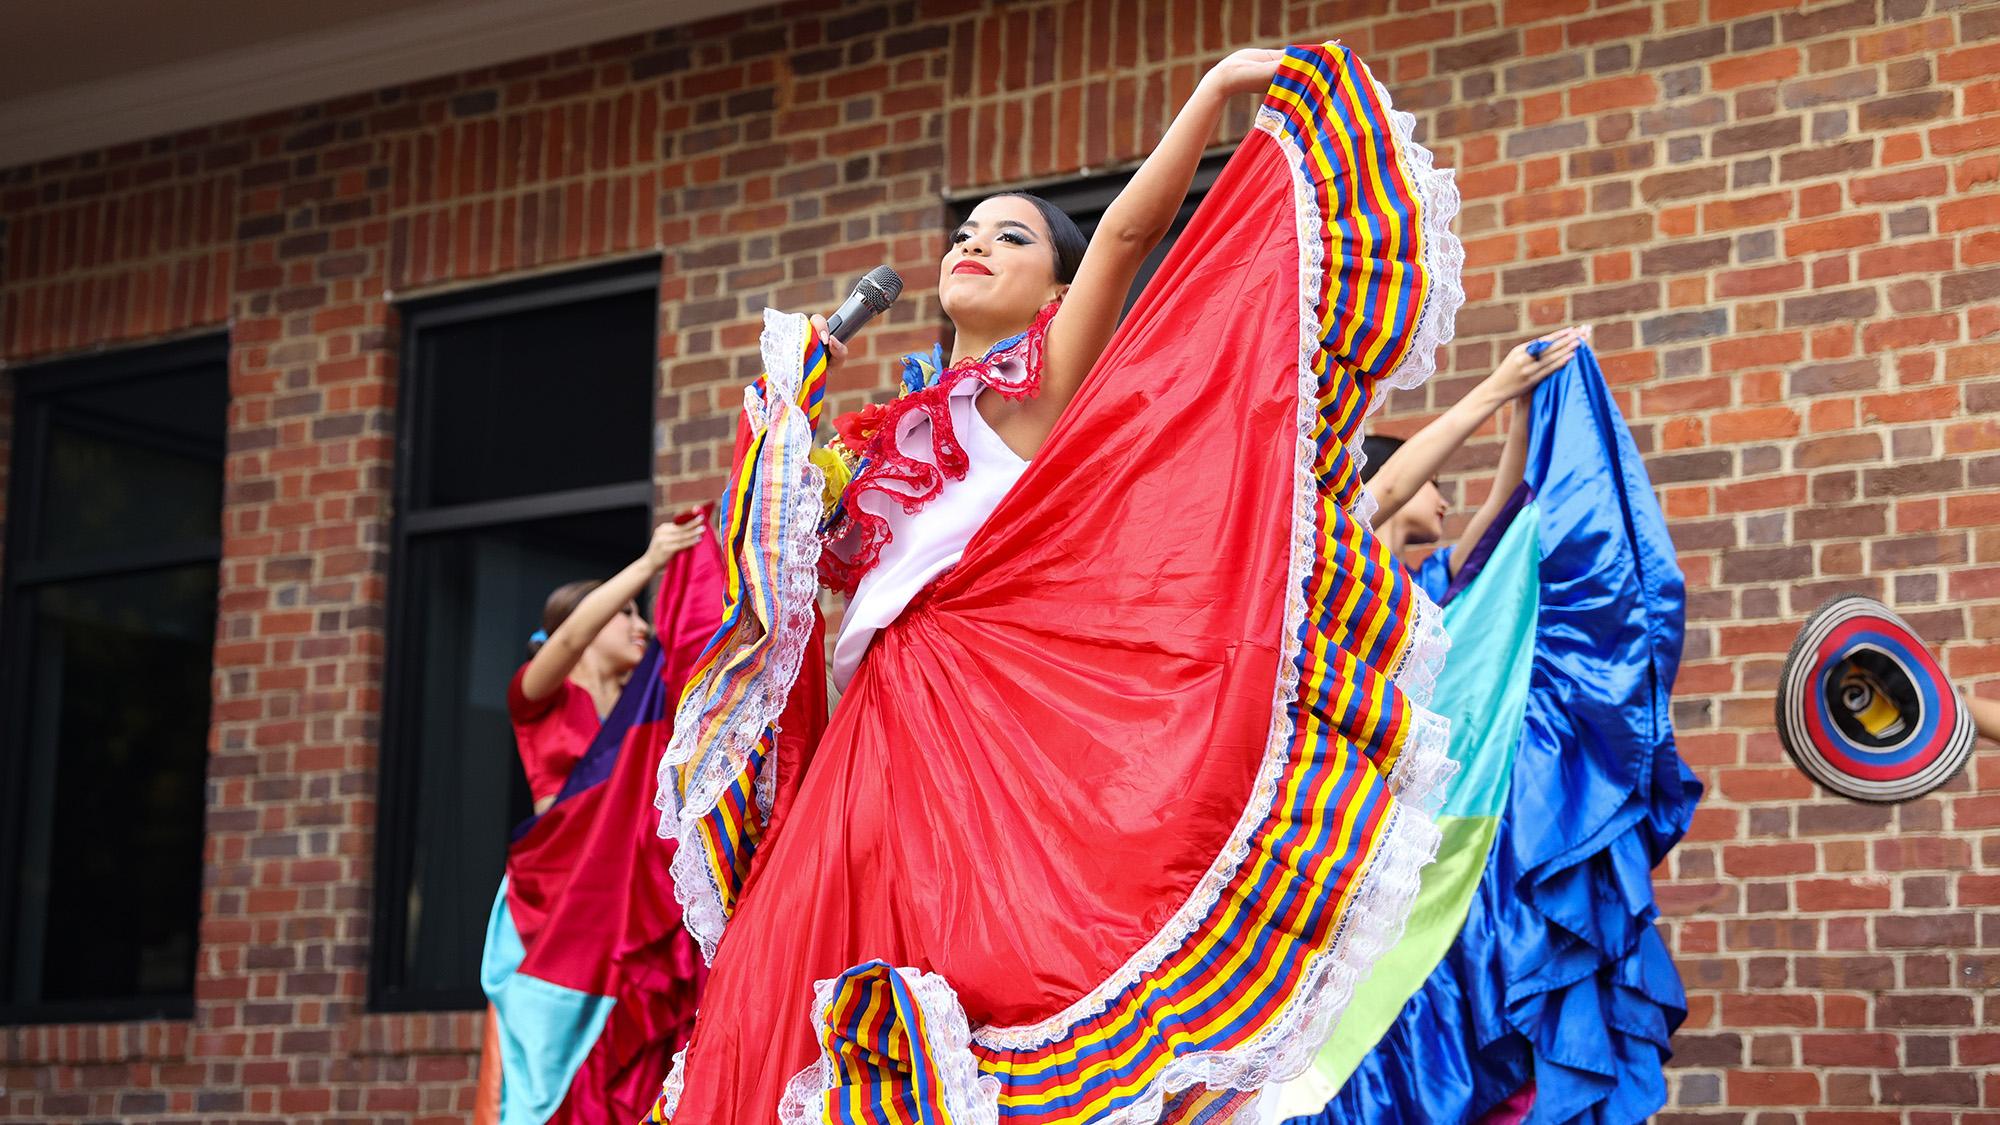 Jaramillo's Latin Dance Academy leads a salsa workshop and performs cumbia, salsa and Latin Hip-Hop dances during Fiesta Hispana.